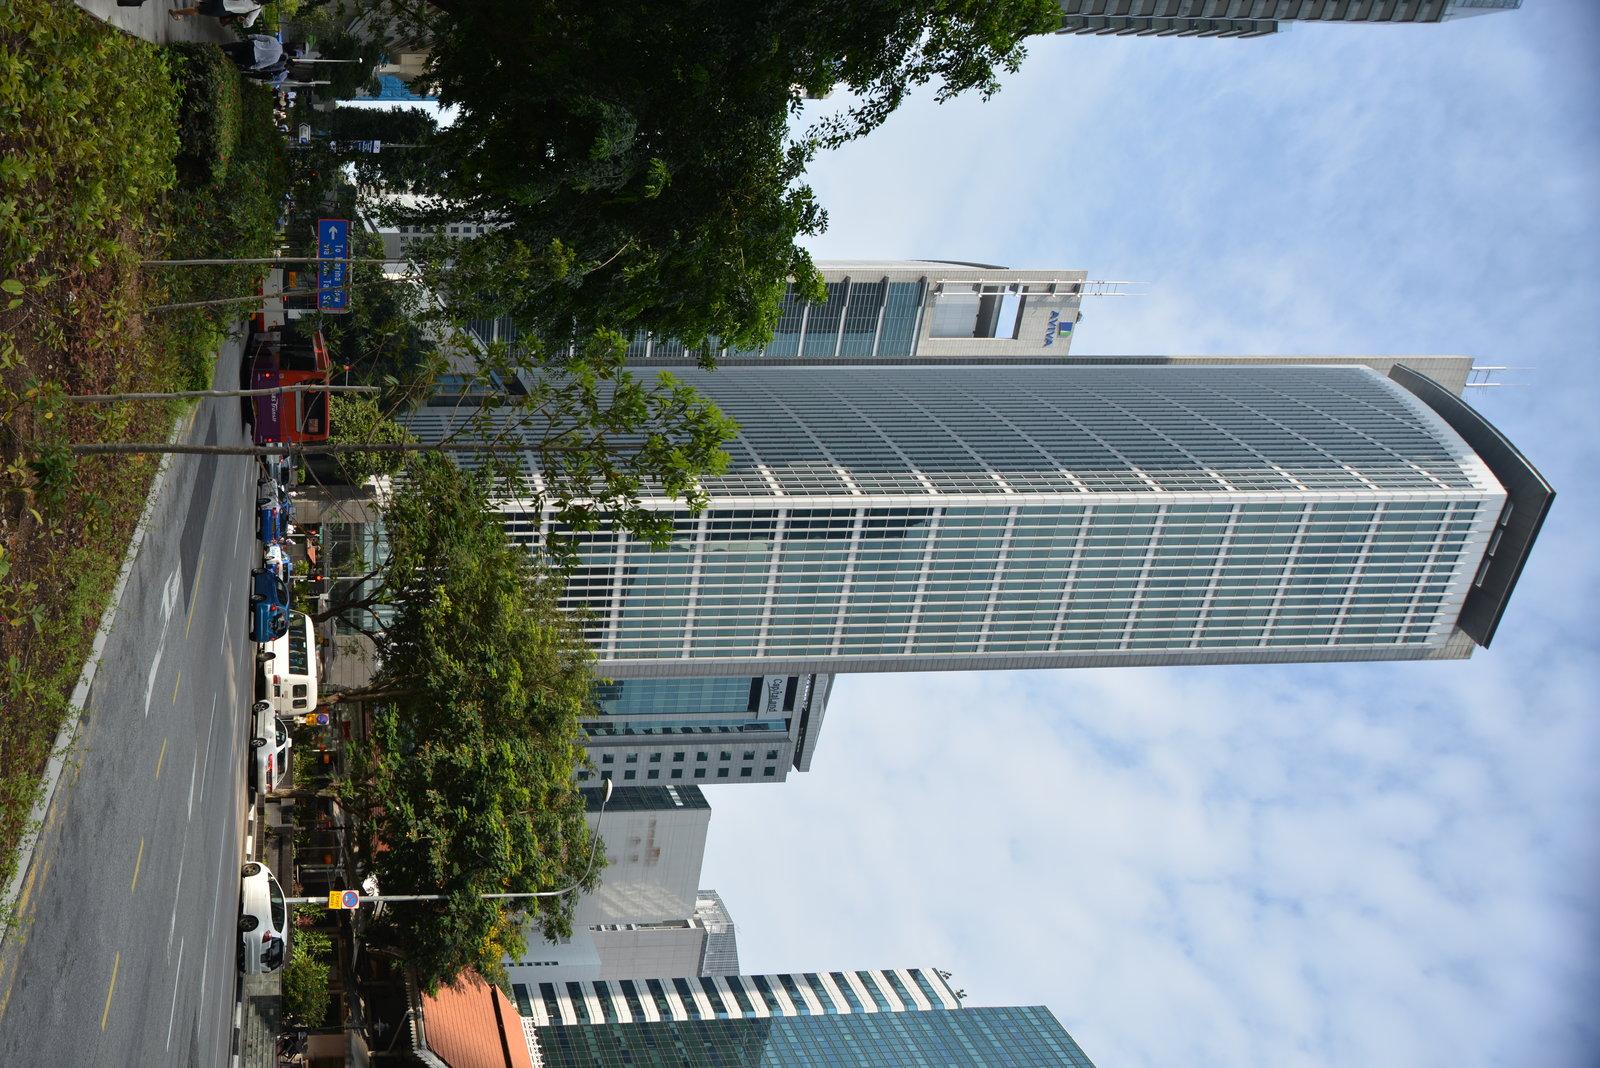 File:SGX Centre, Singapore - 20121015.jpg - Wikimedia Commons